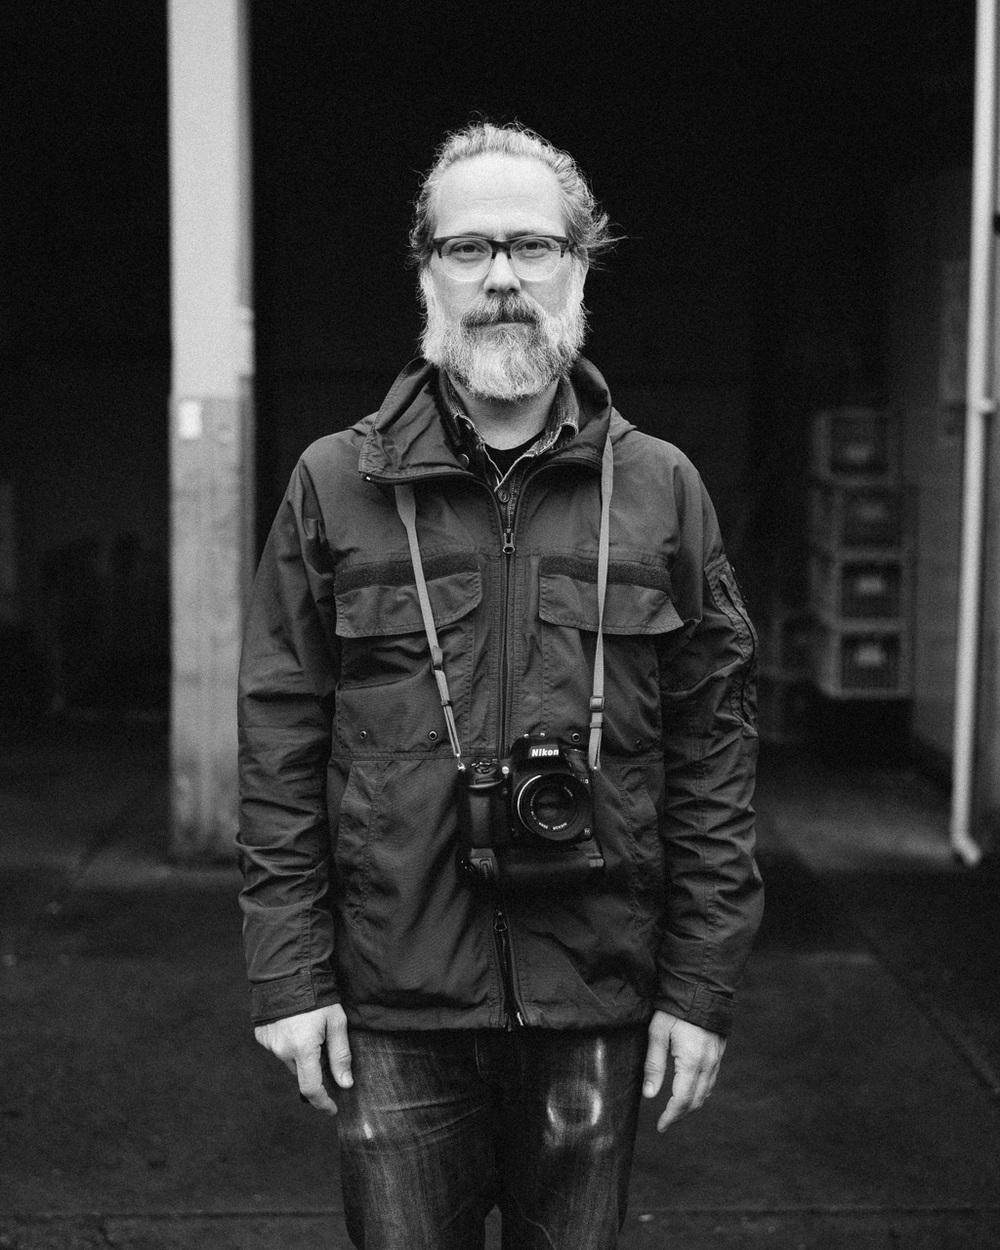 Simon with his Nikon D600 / Sigma 50mm ART camera